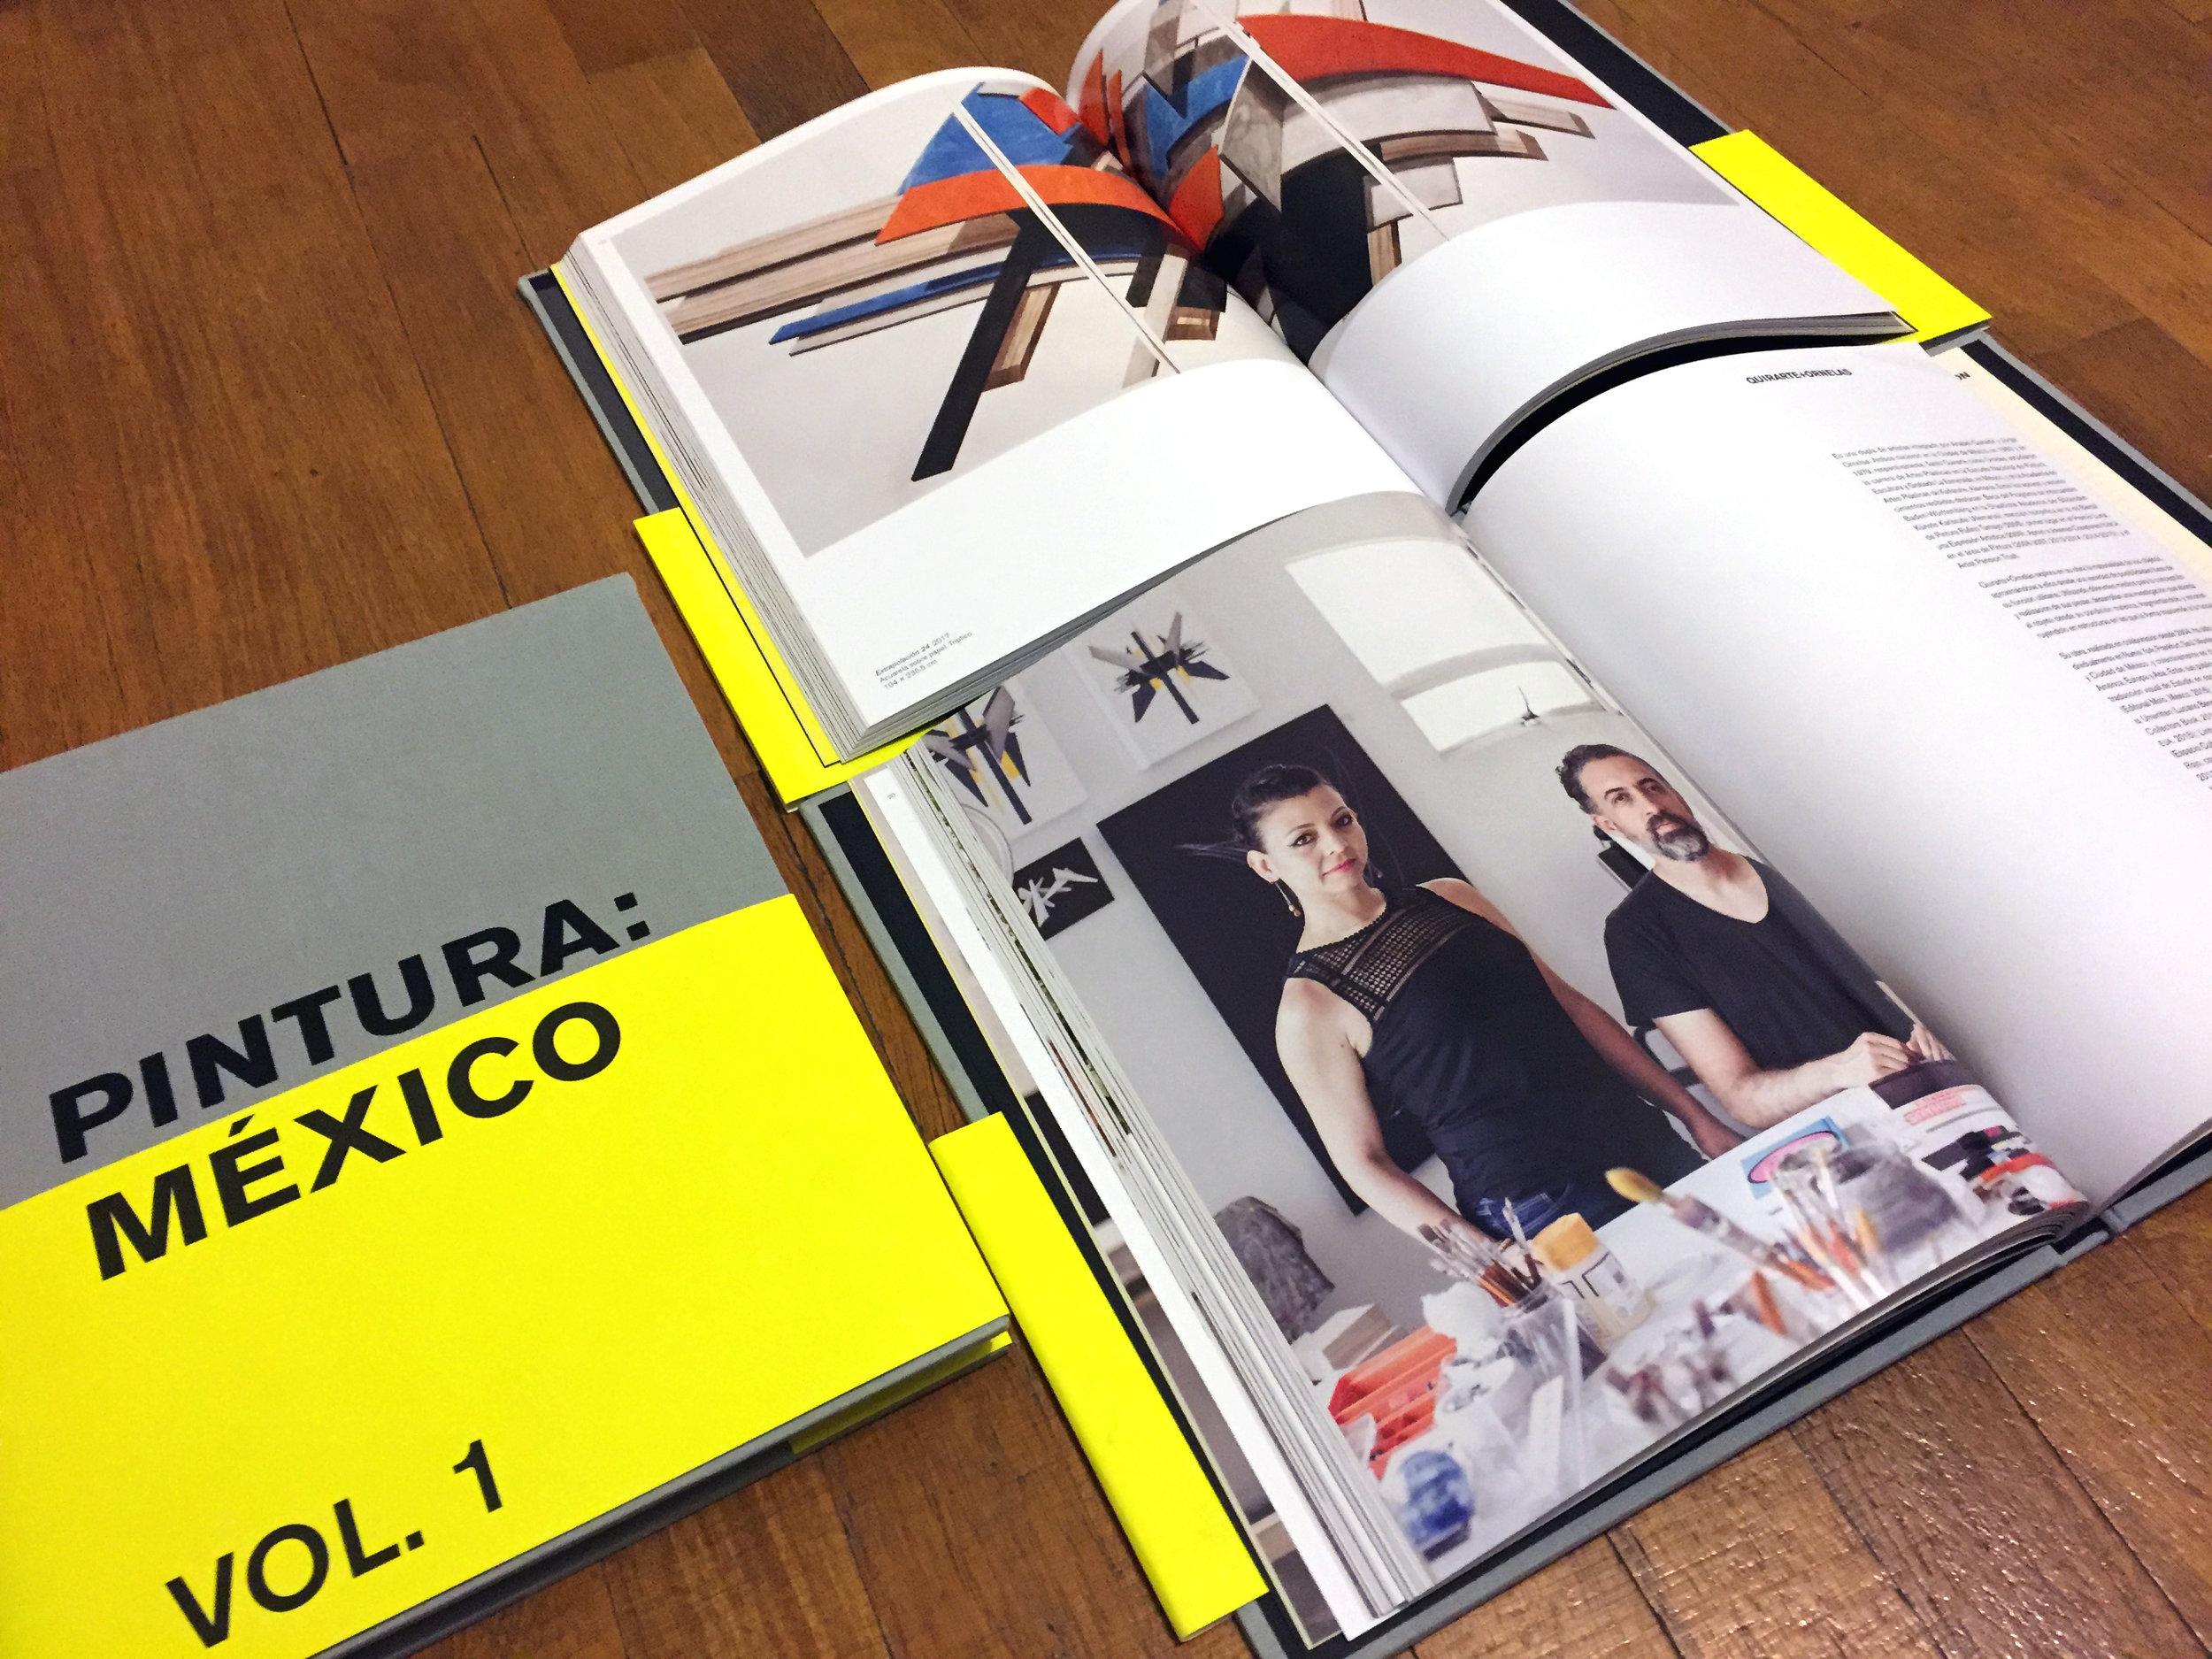 Pintura México Vol 1 Quirarte + Ornelas